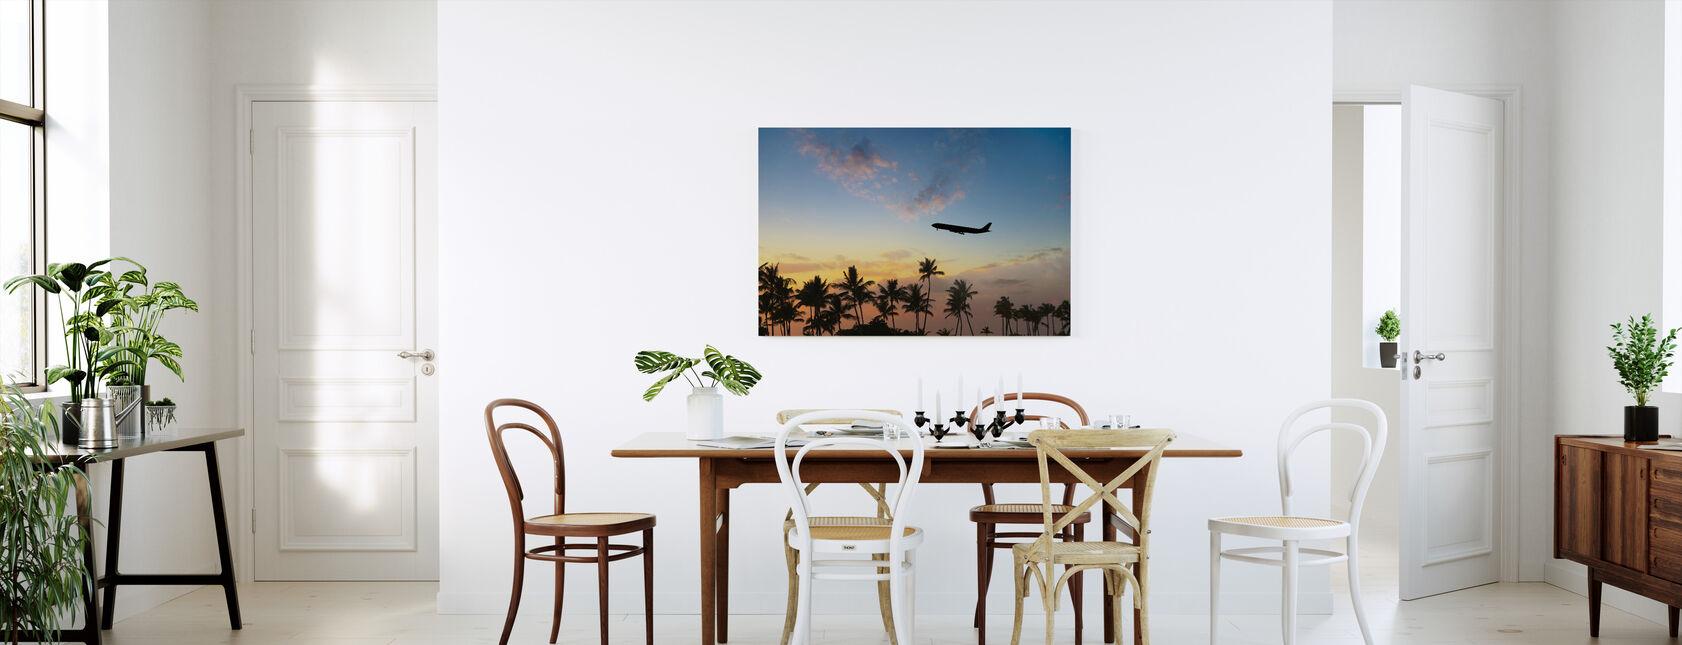 Tropische luchtwegen - Canvas print - Keuken